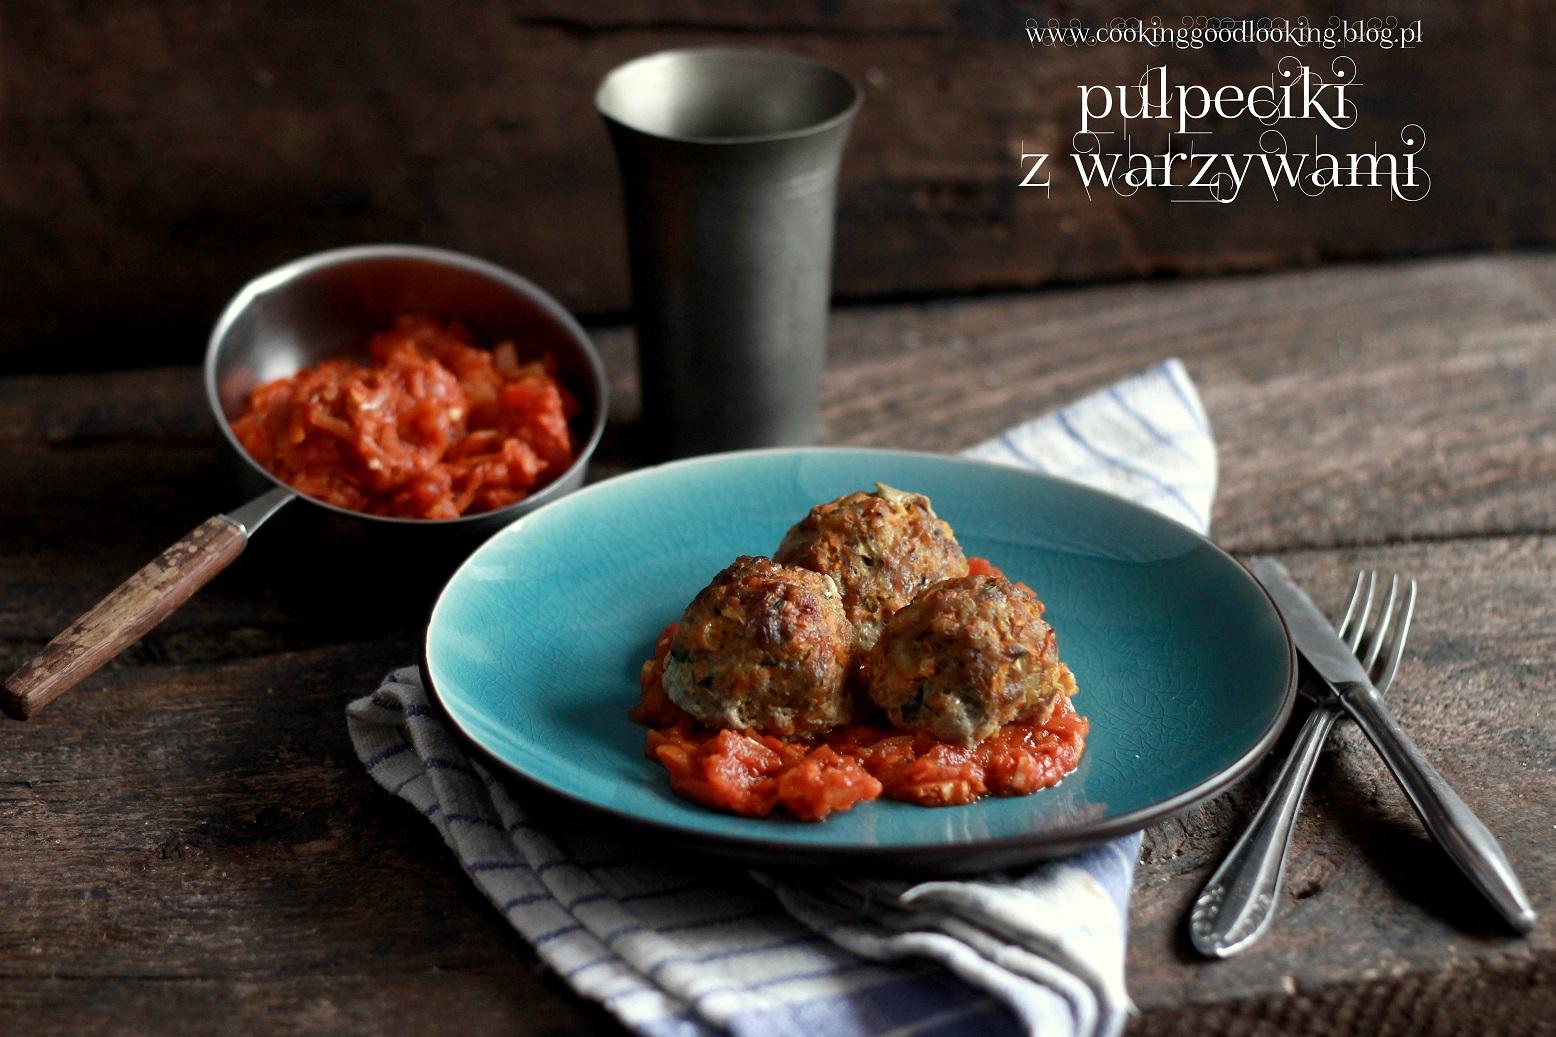 Mega zdrowe pulpeciki z warzywami/ Seriously healthy meatballs with veggies